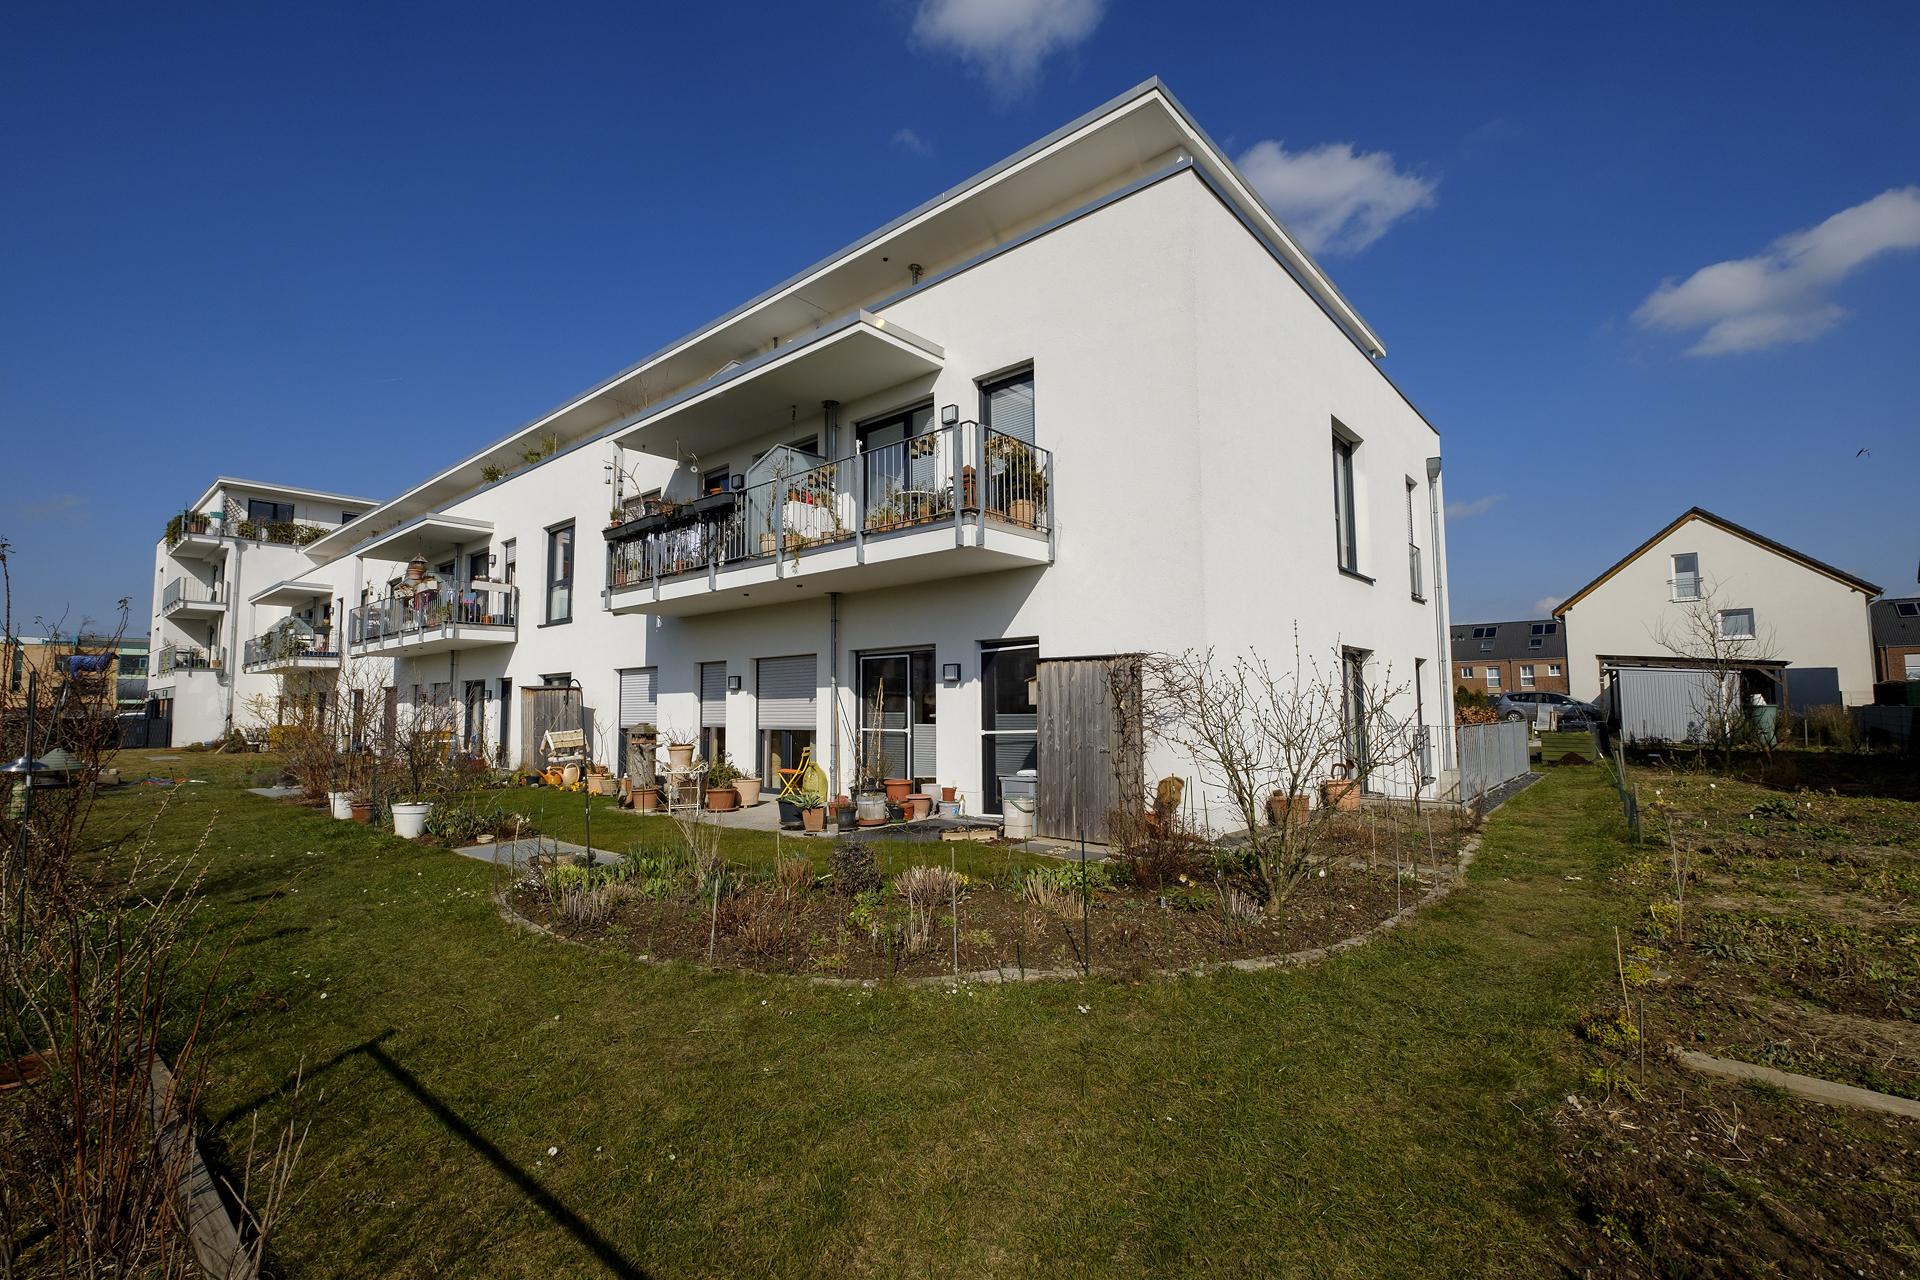 180314-beginenhof-126